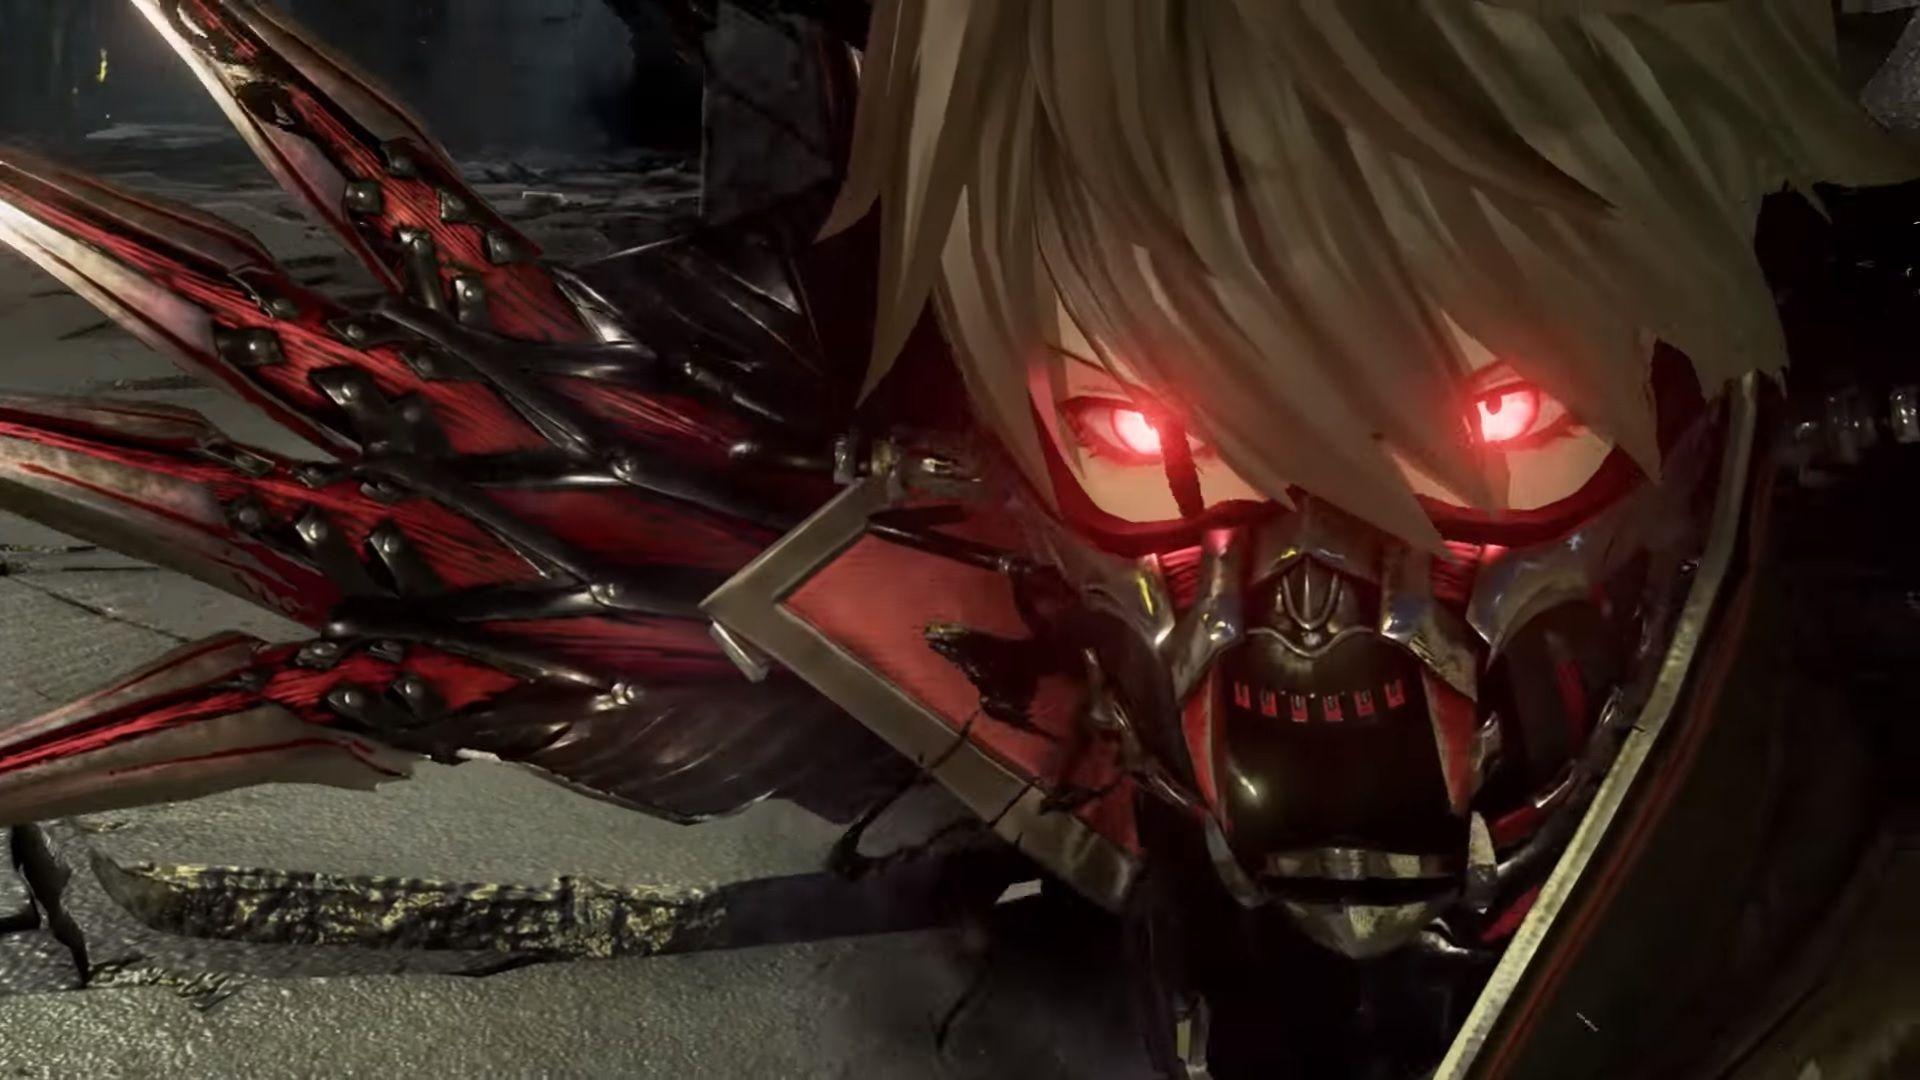 Code Vein news: New characters and weapon screenshots